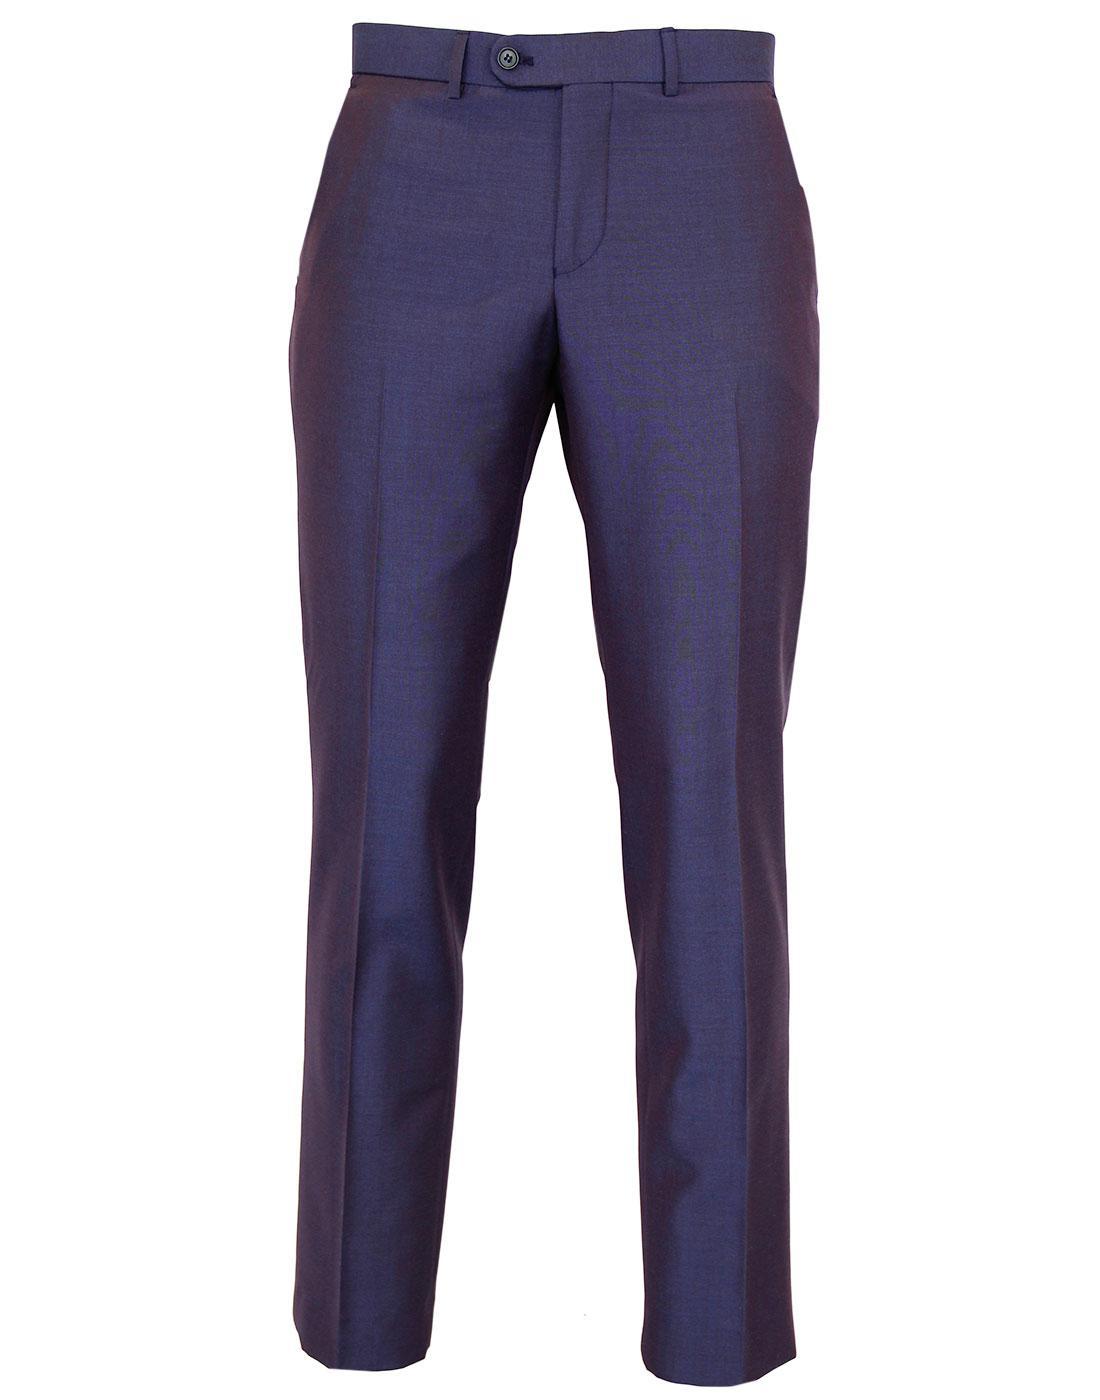 Madcap England 60s Mod Slim Tonic Mohair Trousers